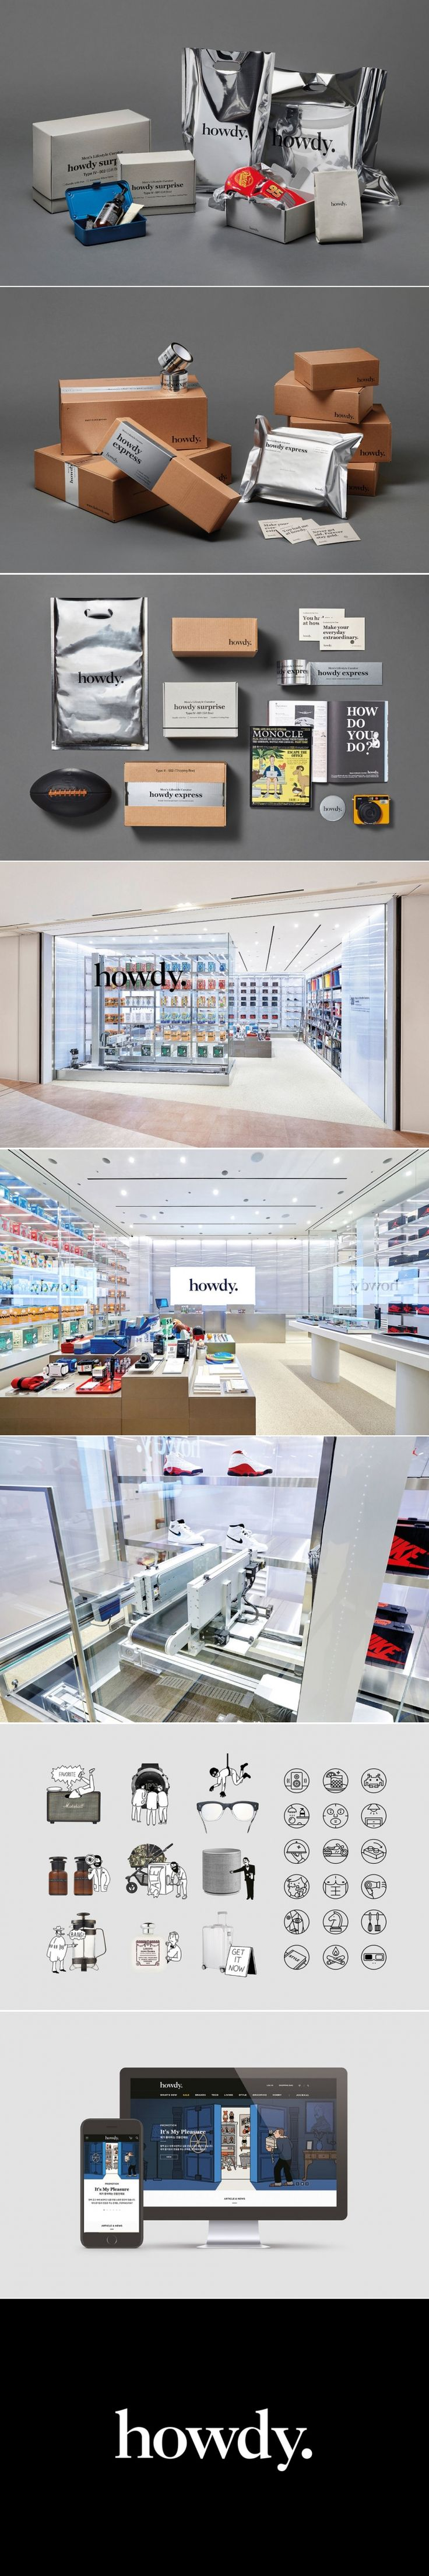 "Say ""Howdy"" To This Elegant E-Commerce Brand — The Dieline | Packaging & Branding Design & Innovation News"